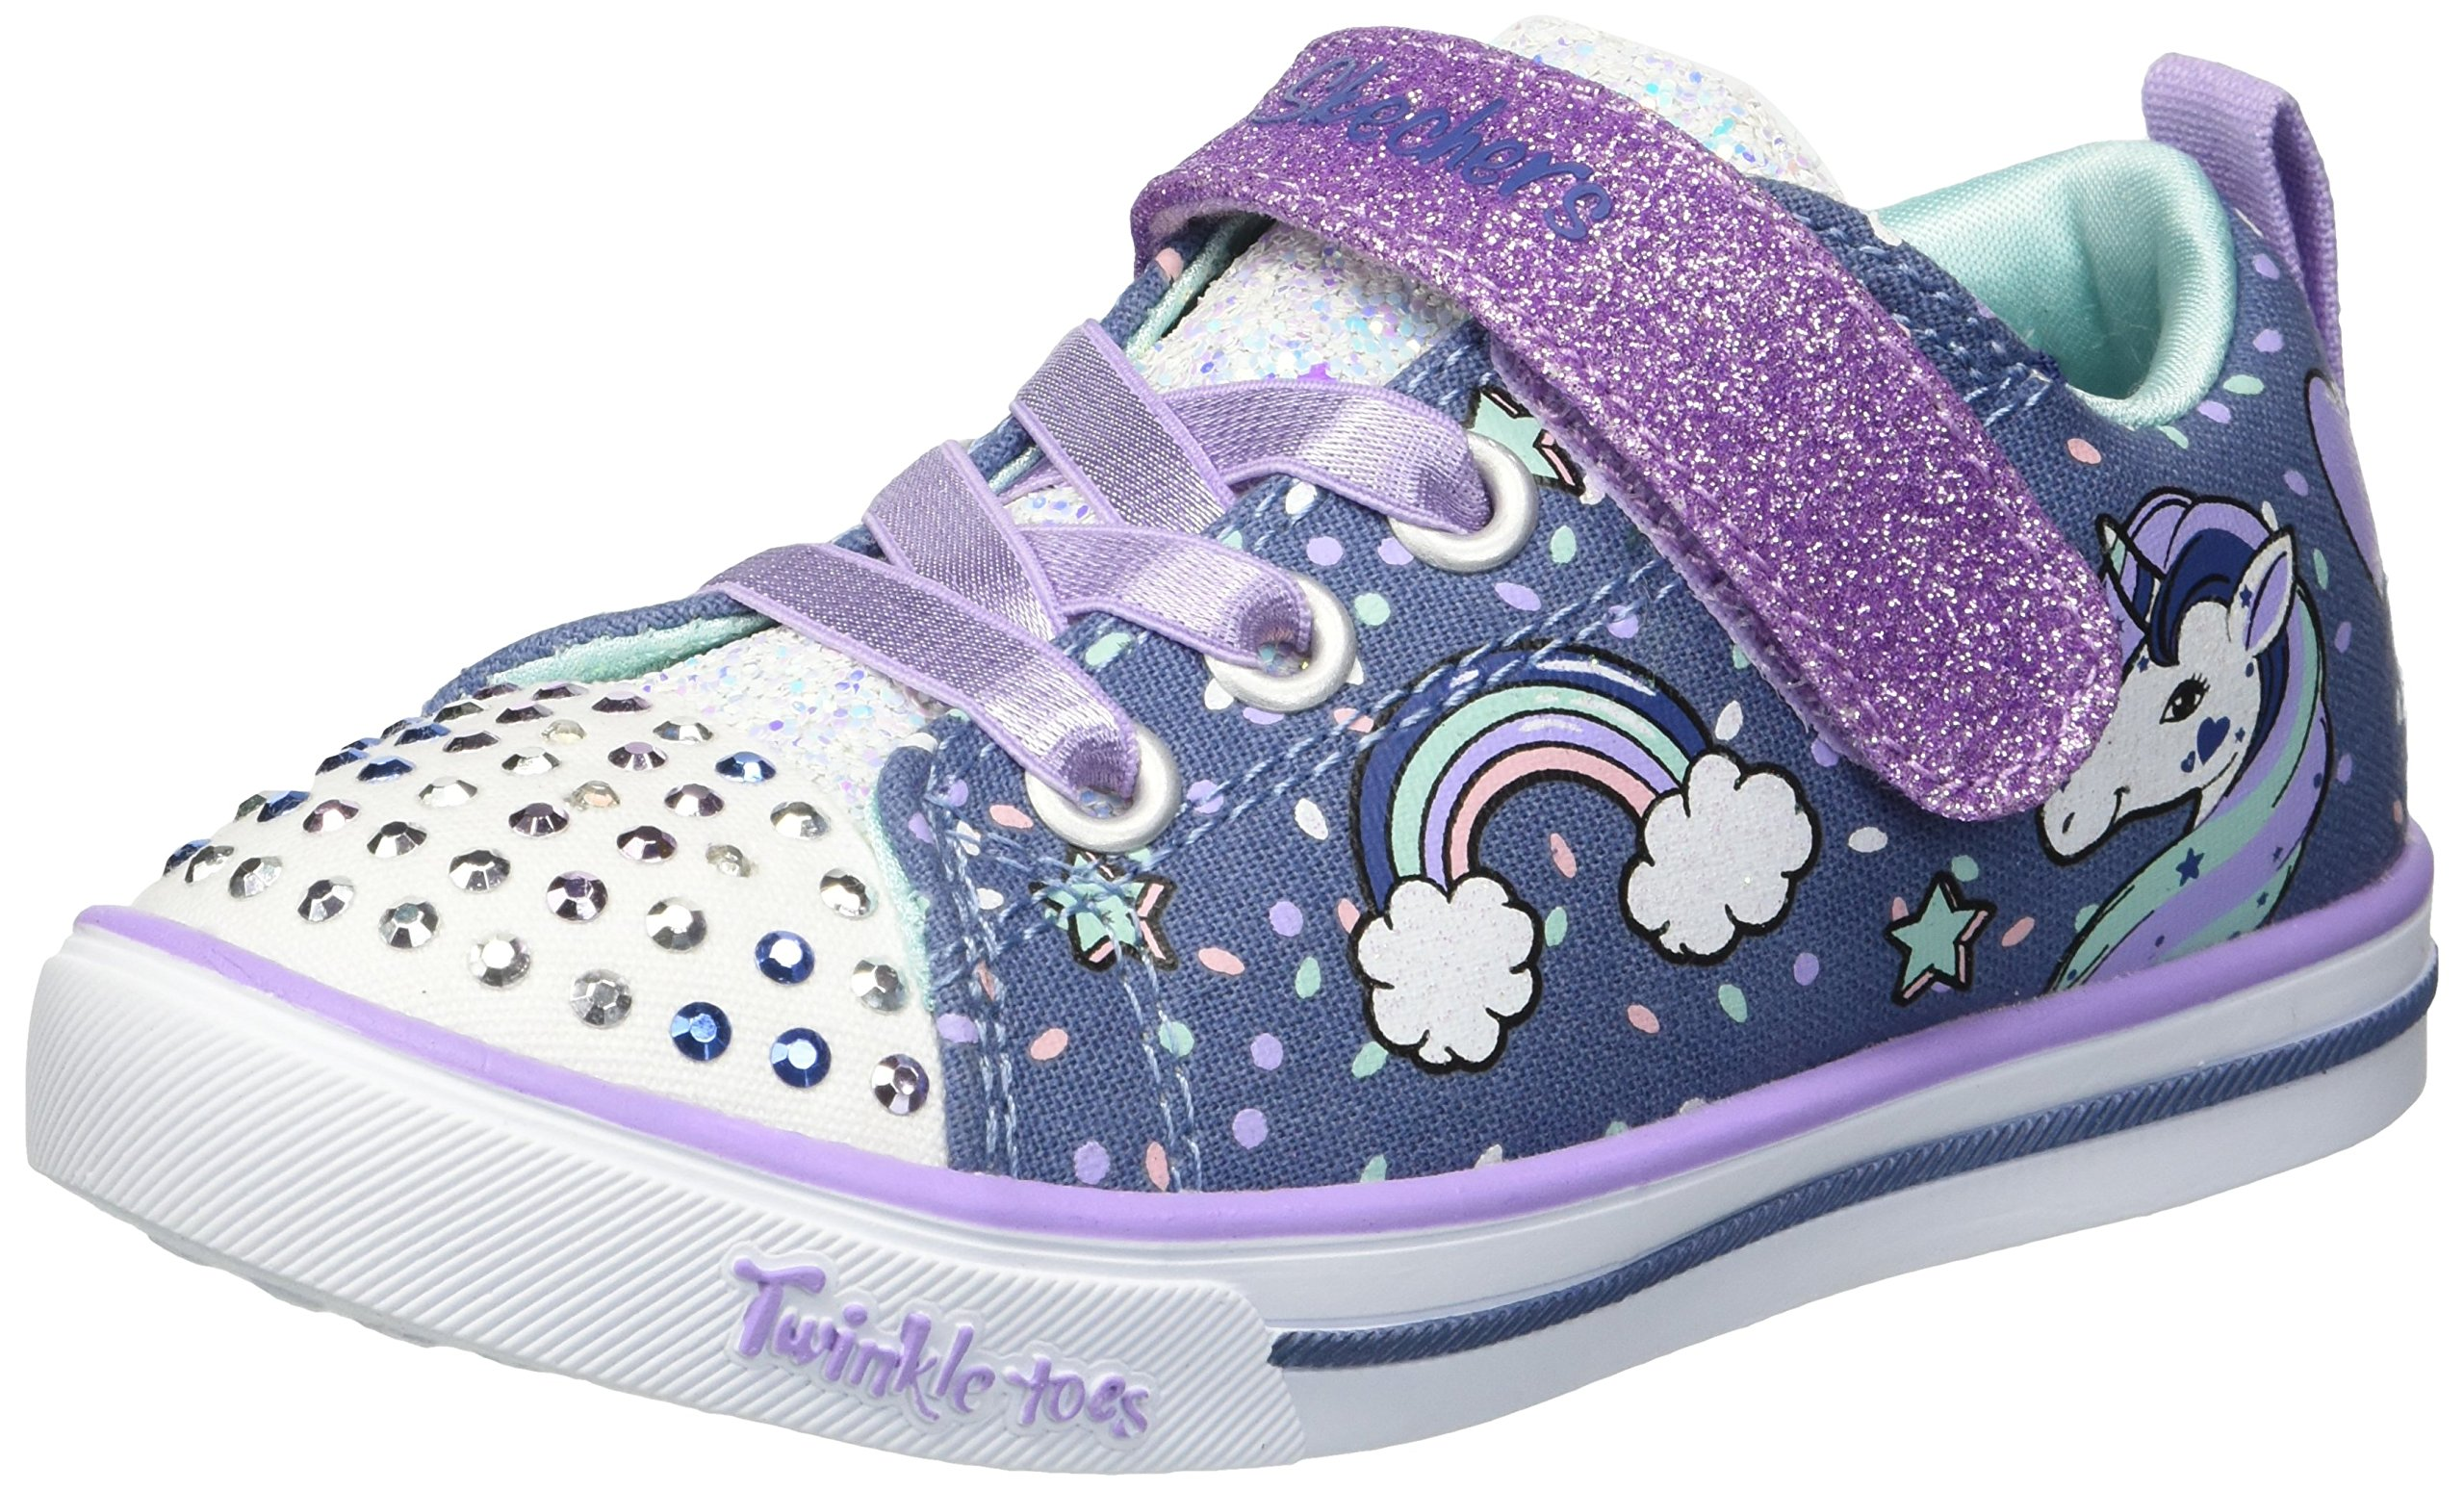 Skechers Kids Girls' Sparkle LITE-Unicorn Craze Sneaker Denim/Lavender 1 Medium US Little Kid